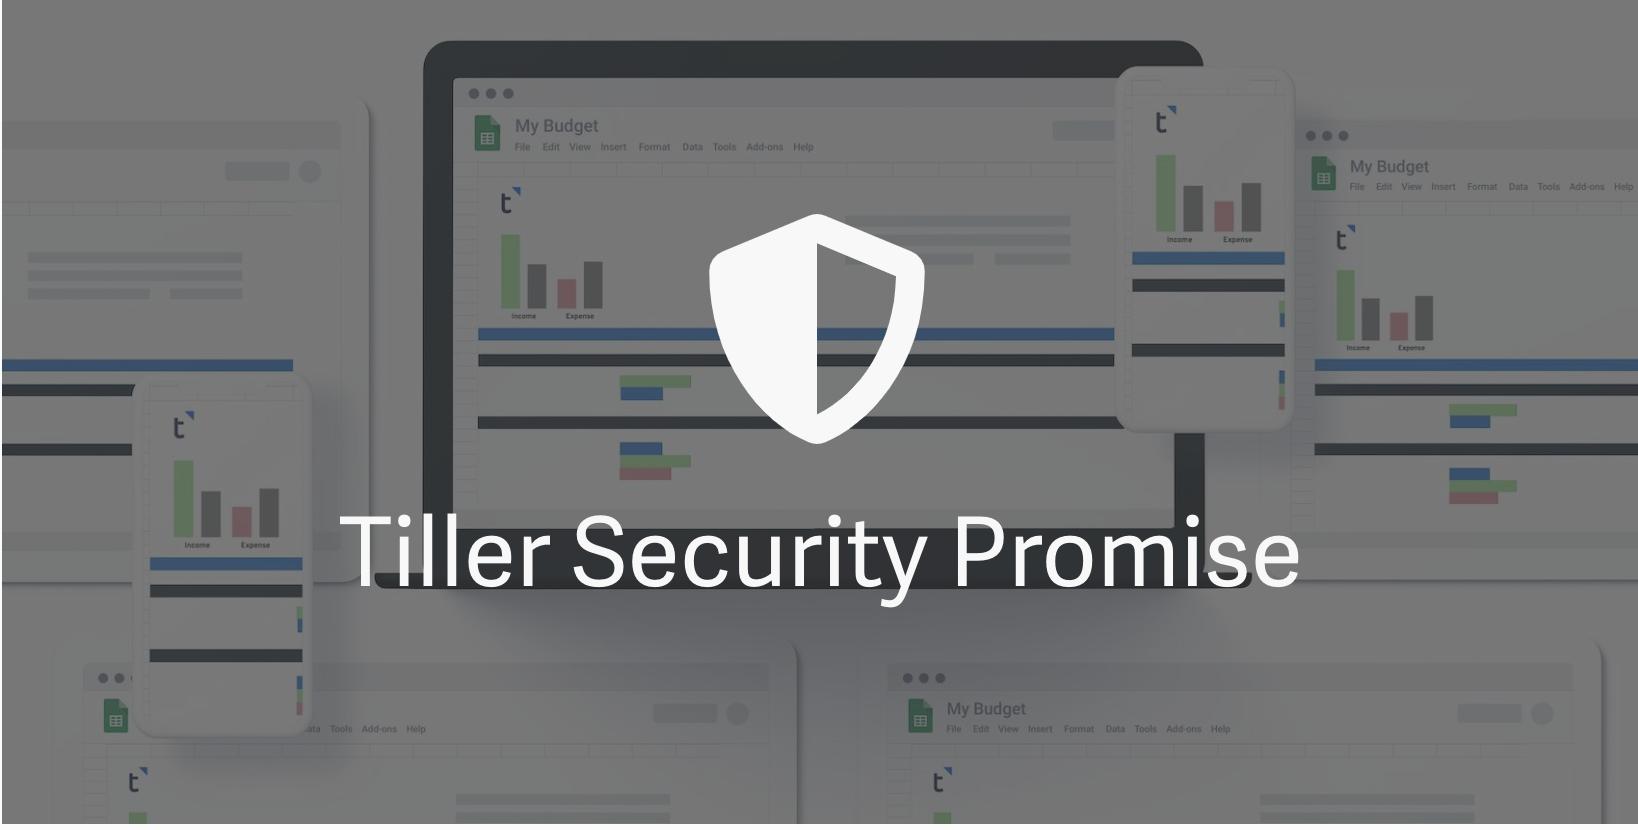 Tiller Security Promise